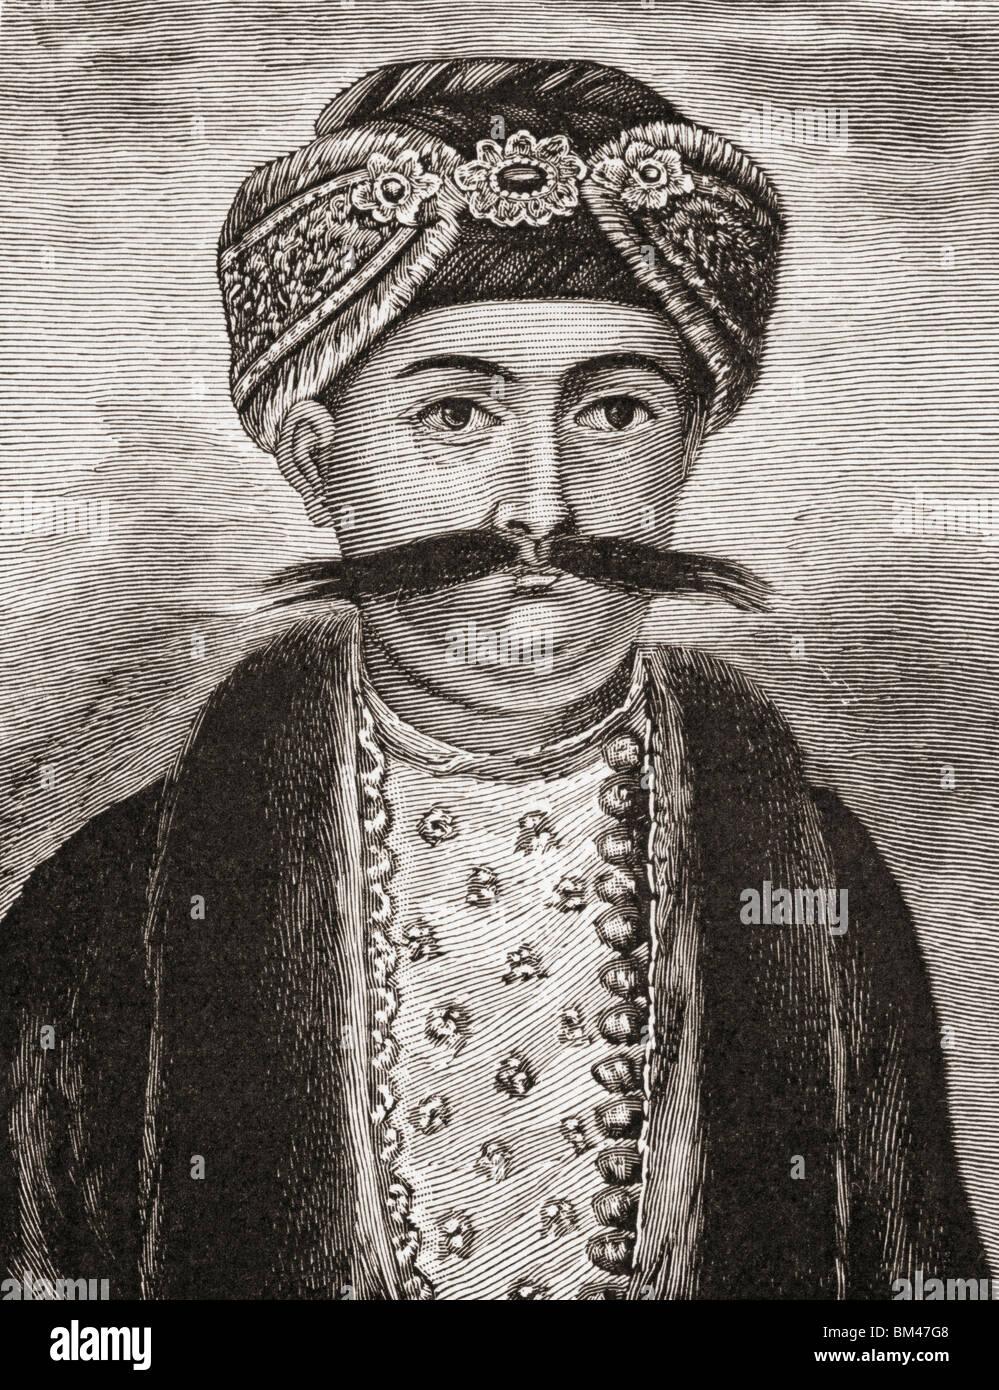 Mîrza Muhammad Siraj-ud-Daulah aka Siraj ud-Daulah,1733 to 1757. Nawab of Bengal, Bihar and Orissa. - Stock Image